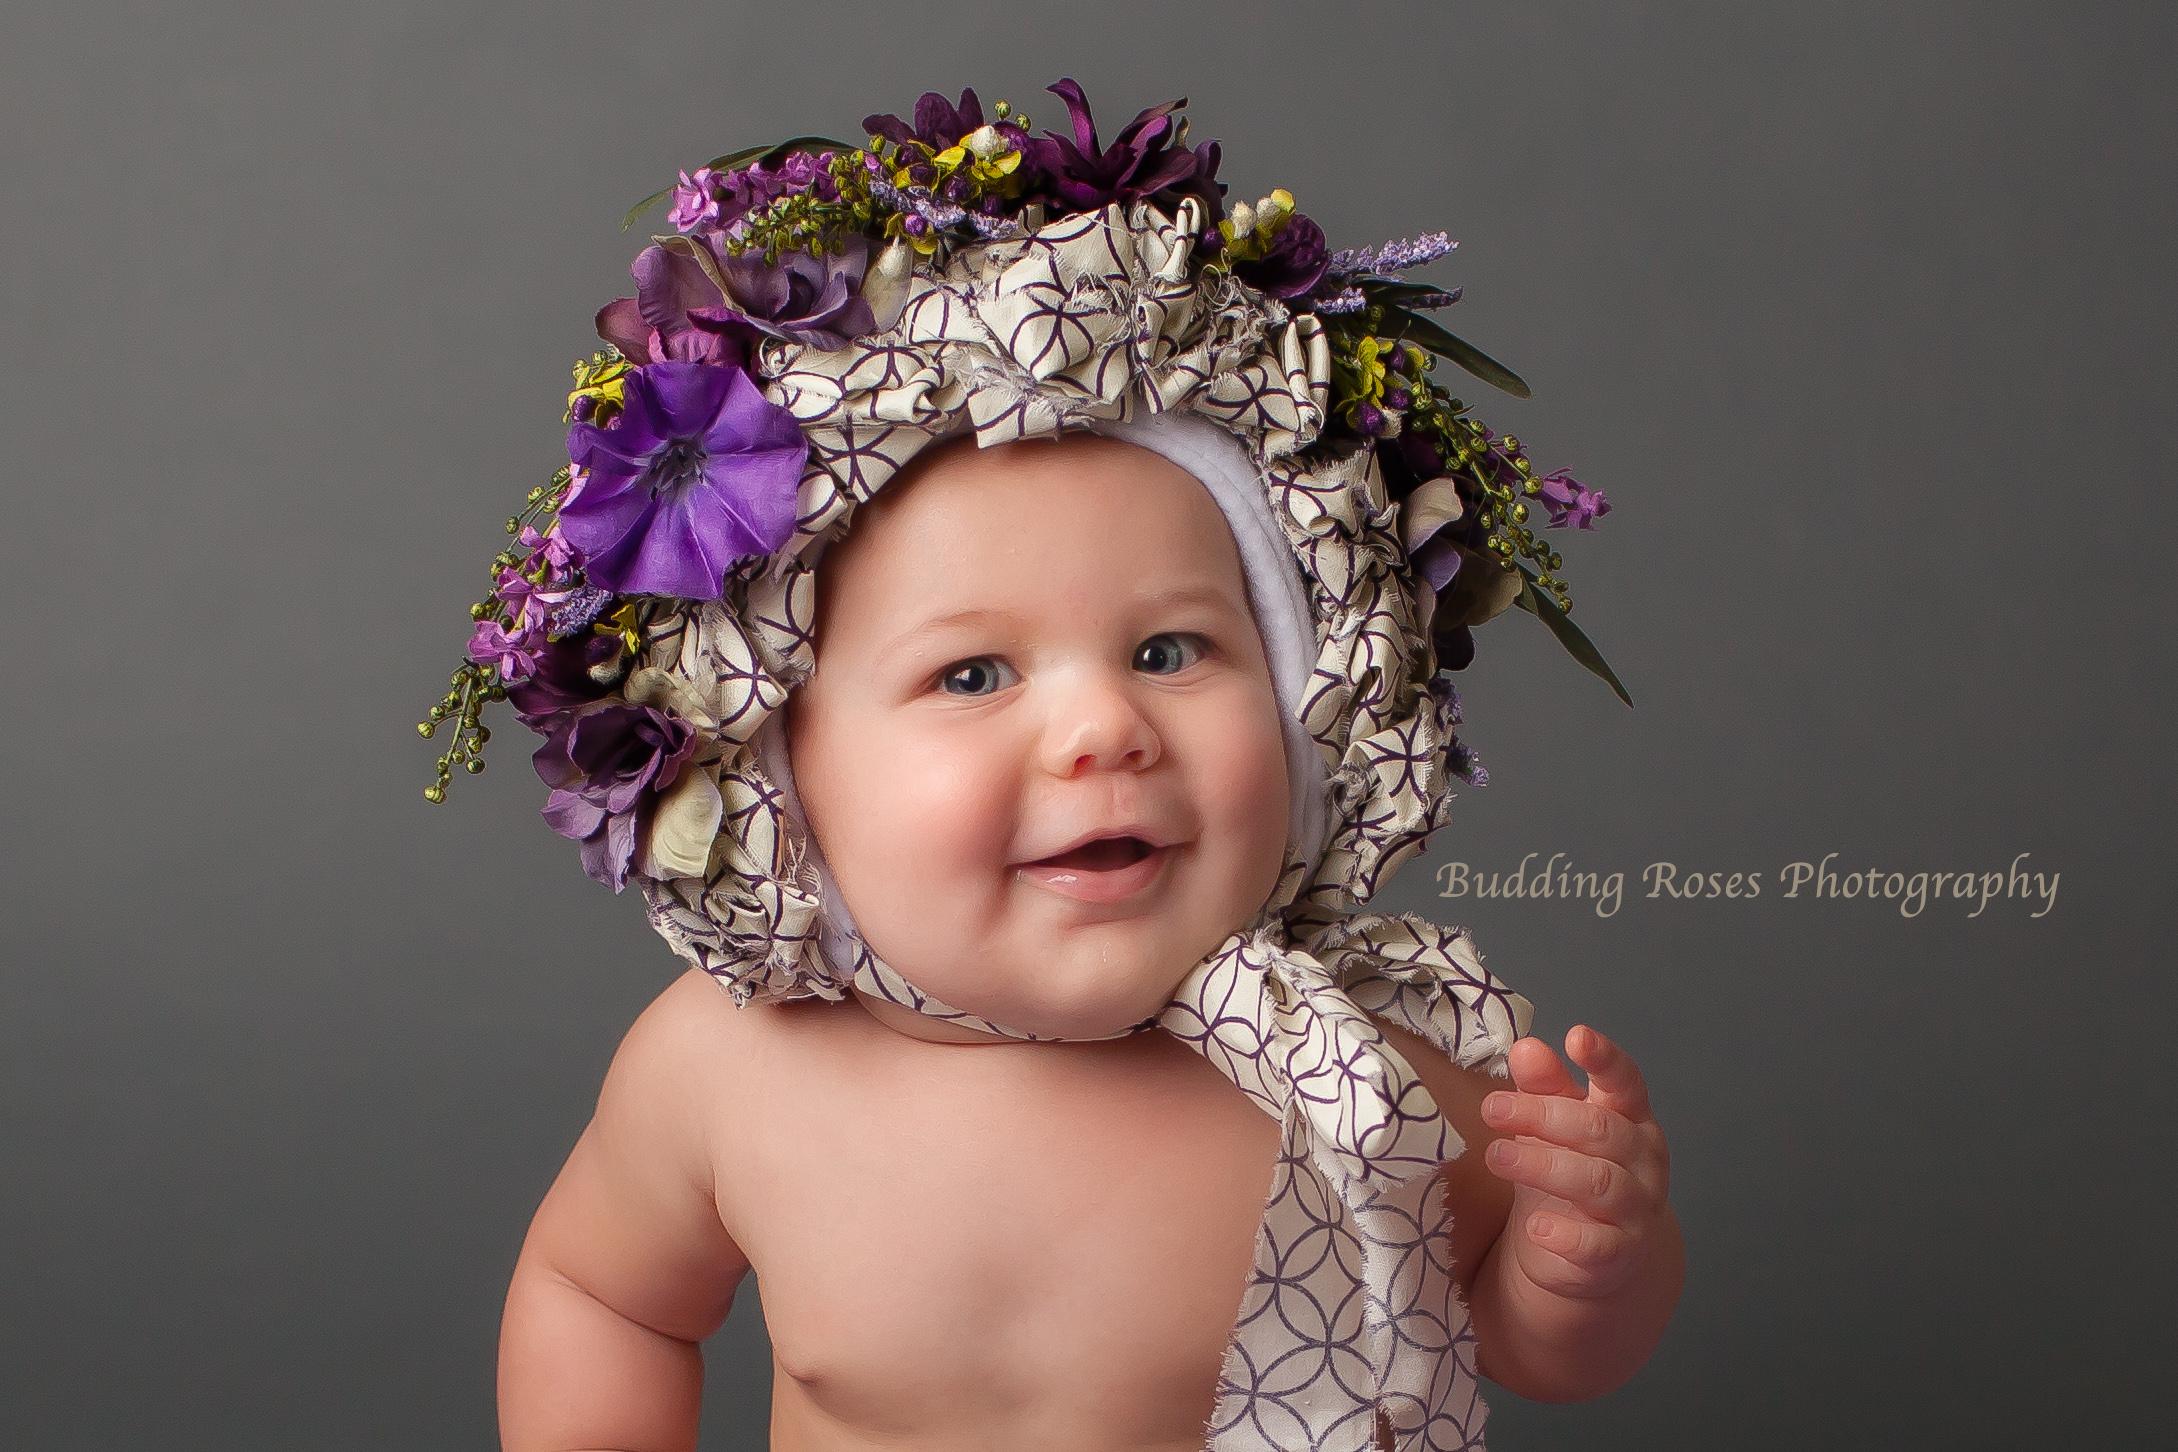 sitter session, sitter photoshoot, milestone session, aubree, child portrait, child photo, new jersey photographer